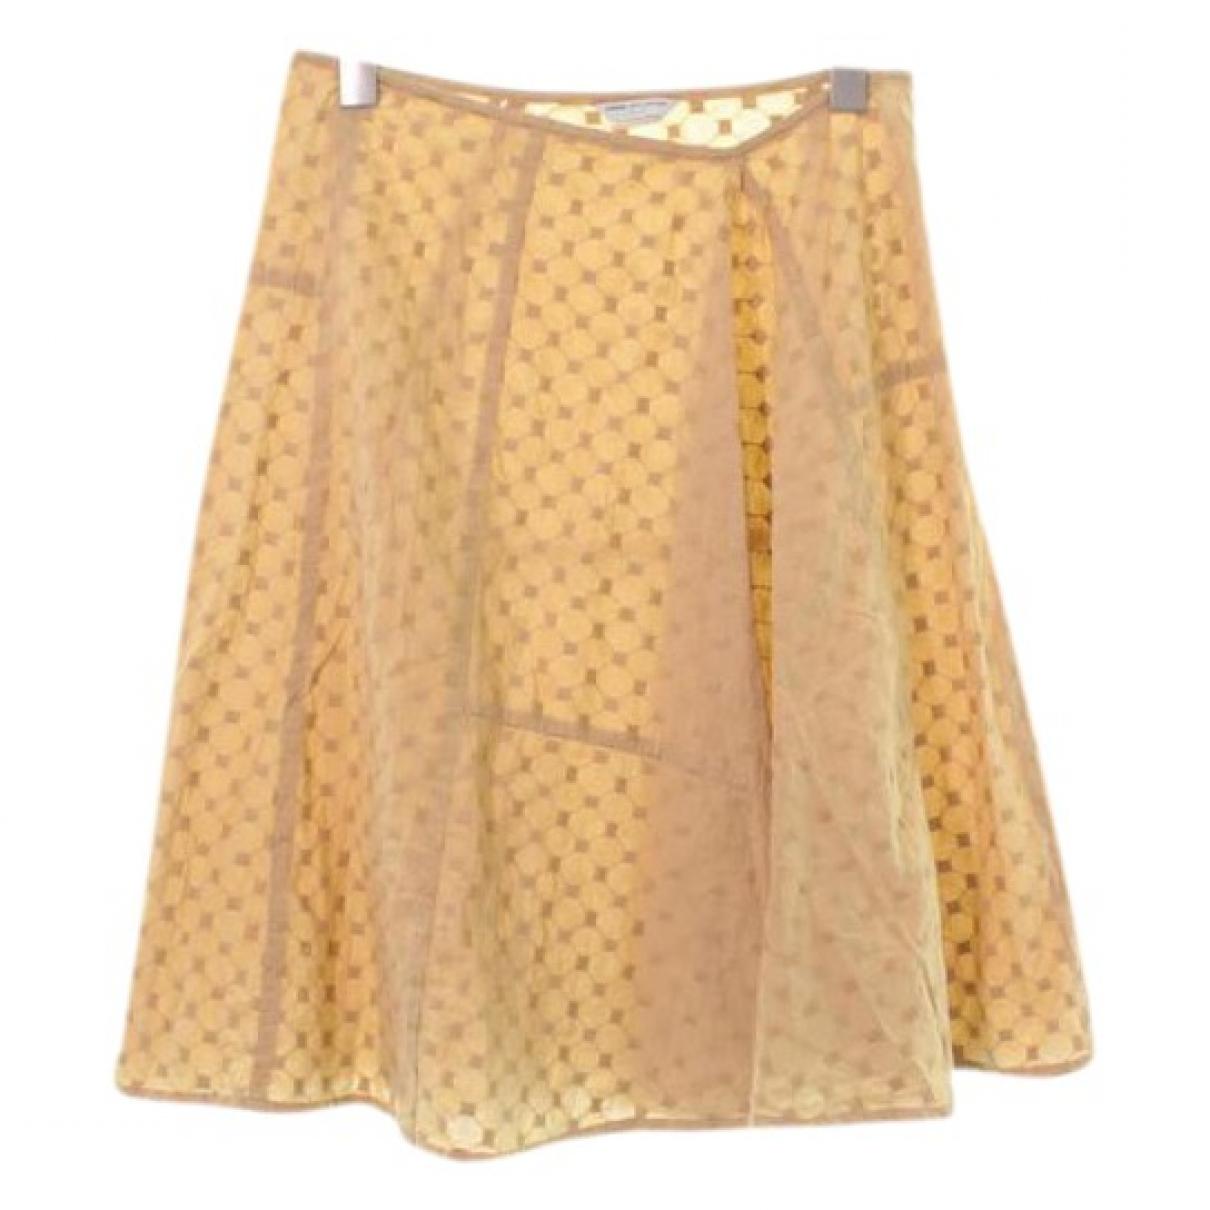 Dries Van Noten - Jupe   pour femme en coton - beige